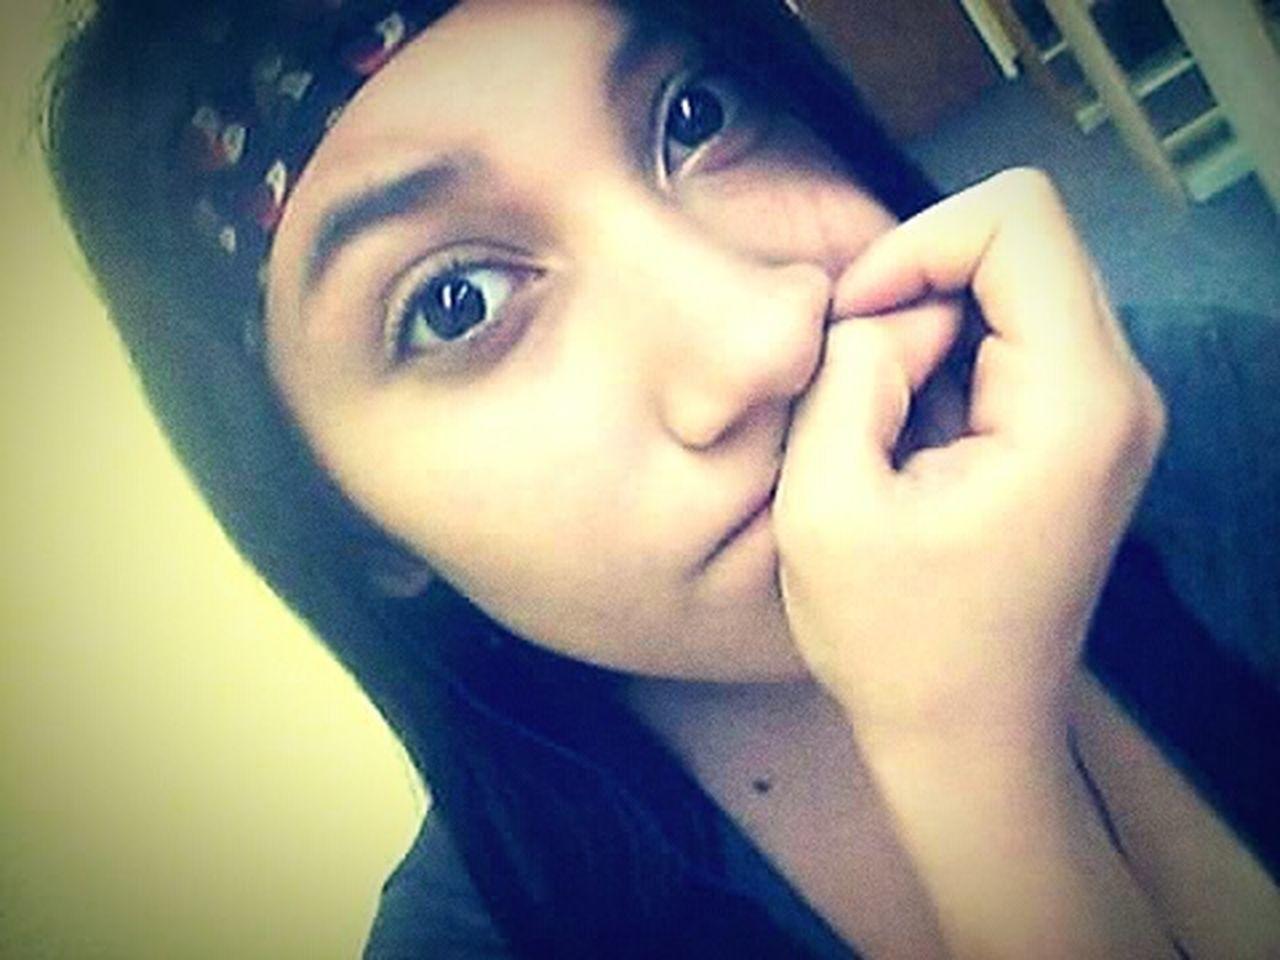 Eyes that shine HMU ♥